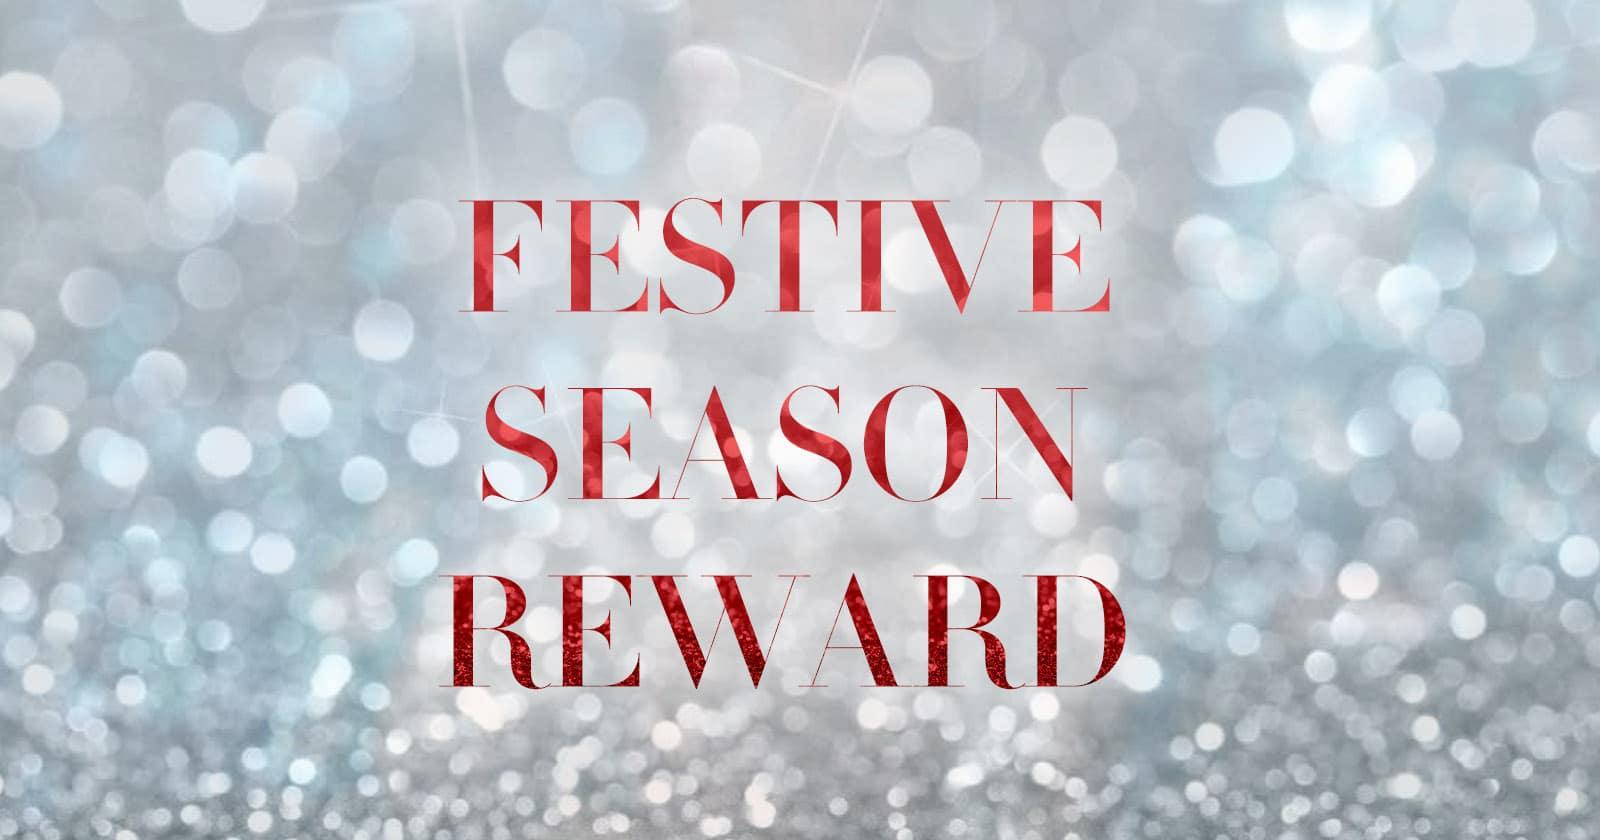 Festive Season Reward 1